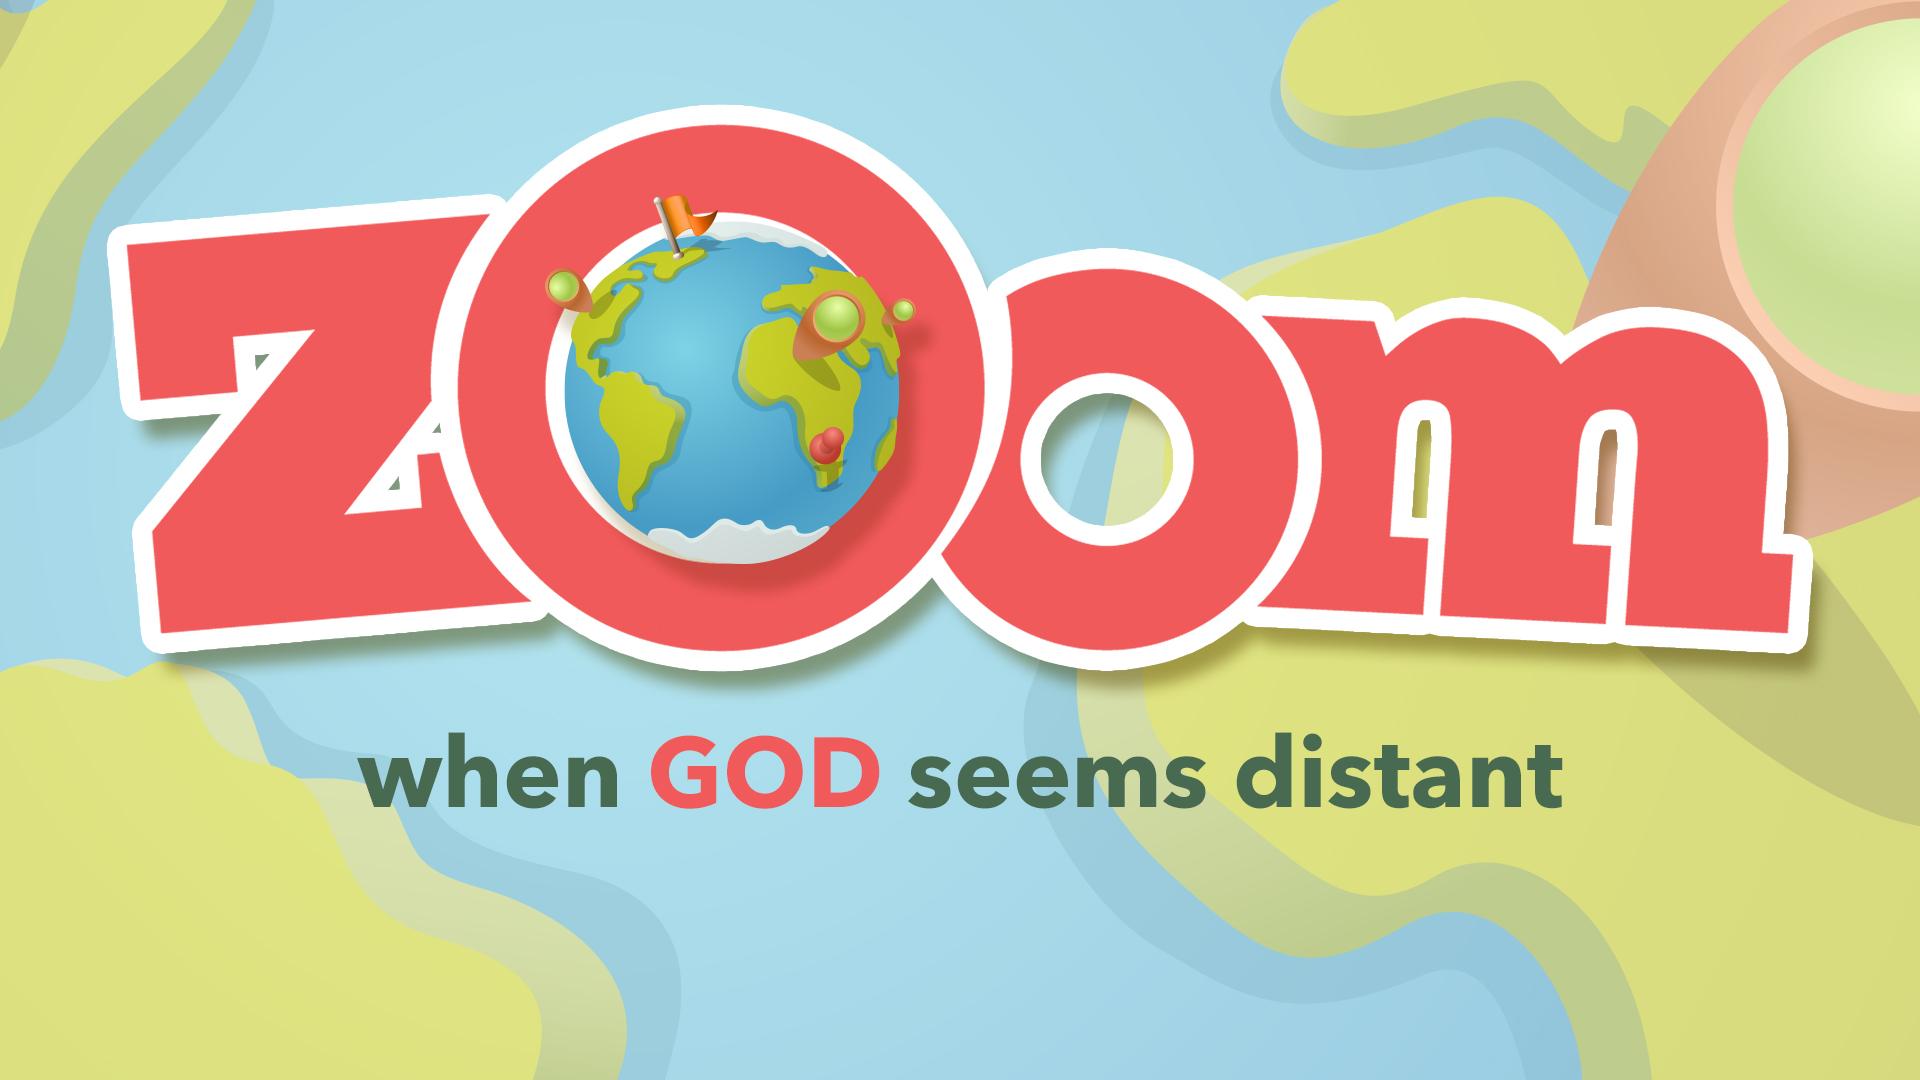 Zoom - HD logo.jpg